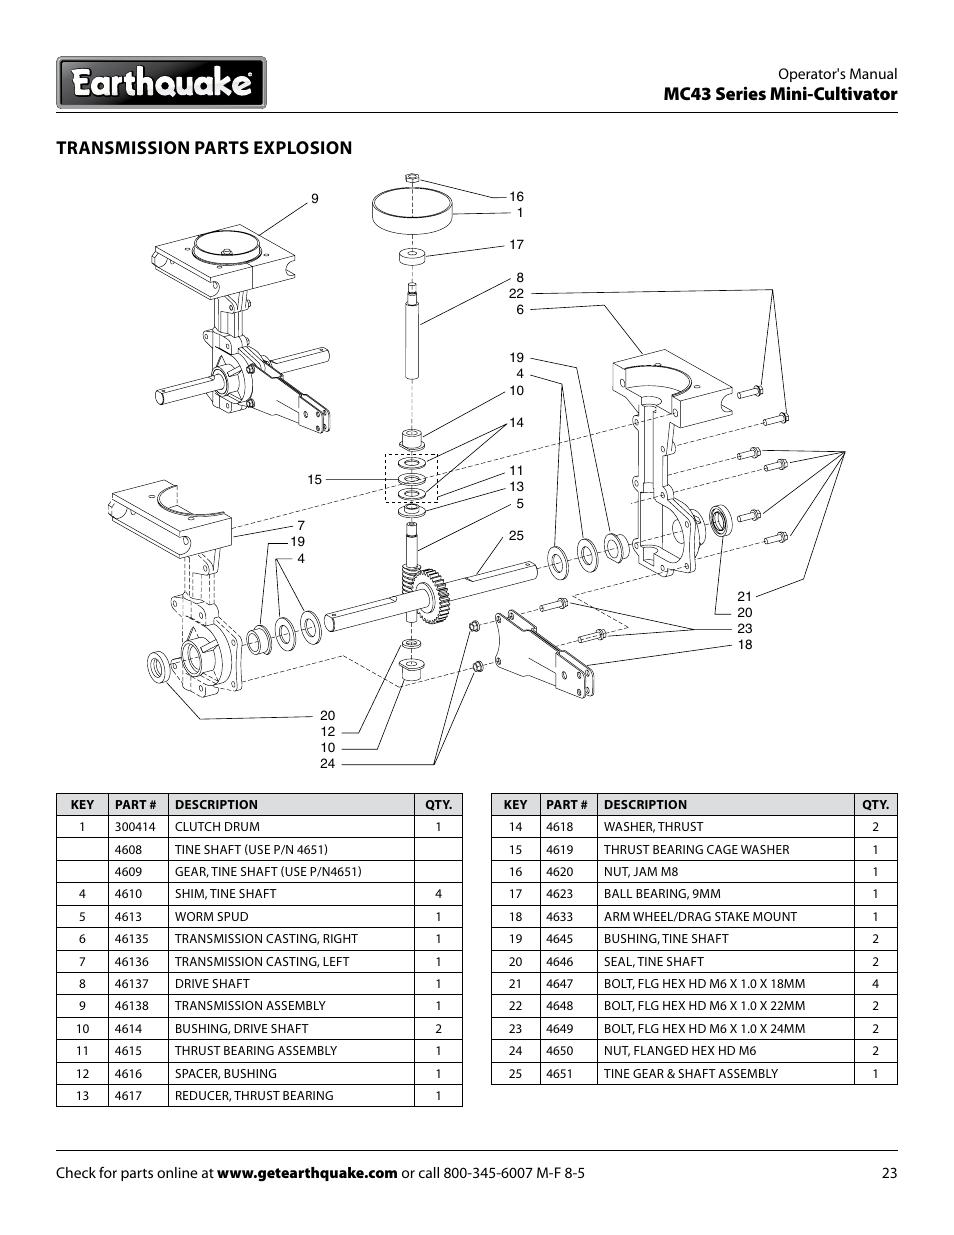 Mc43 series mini-cultivator, Transmission parts explosion